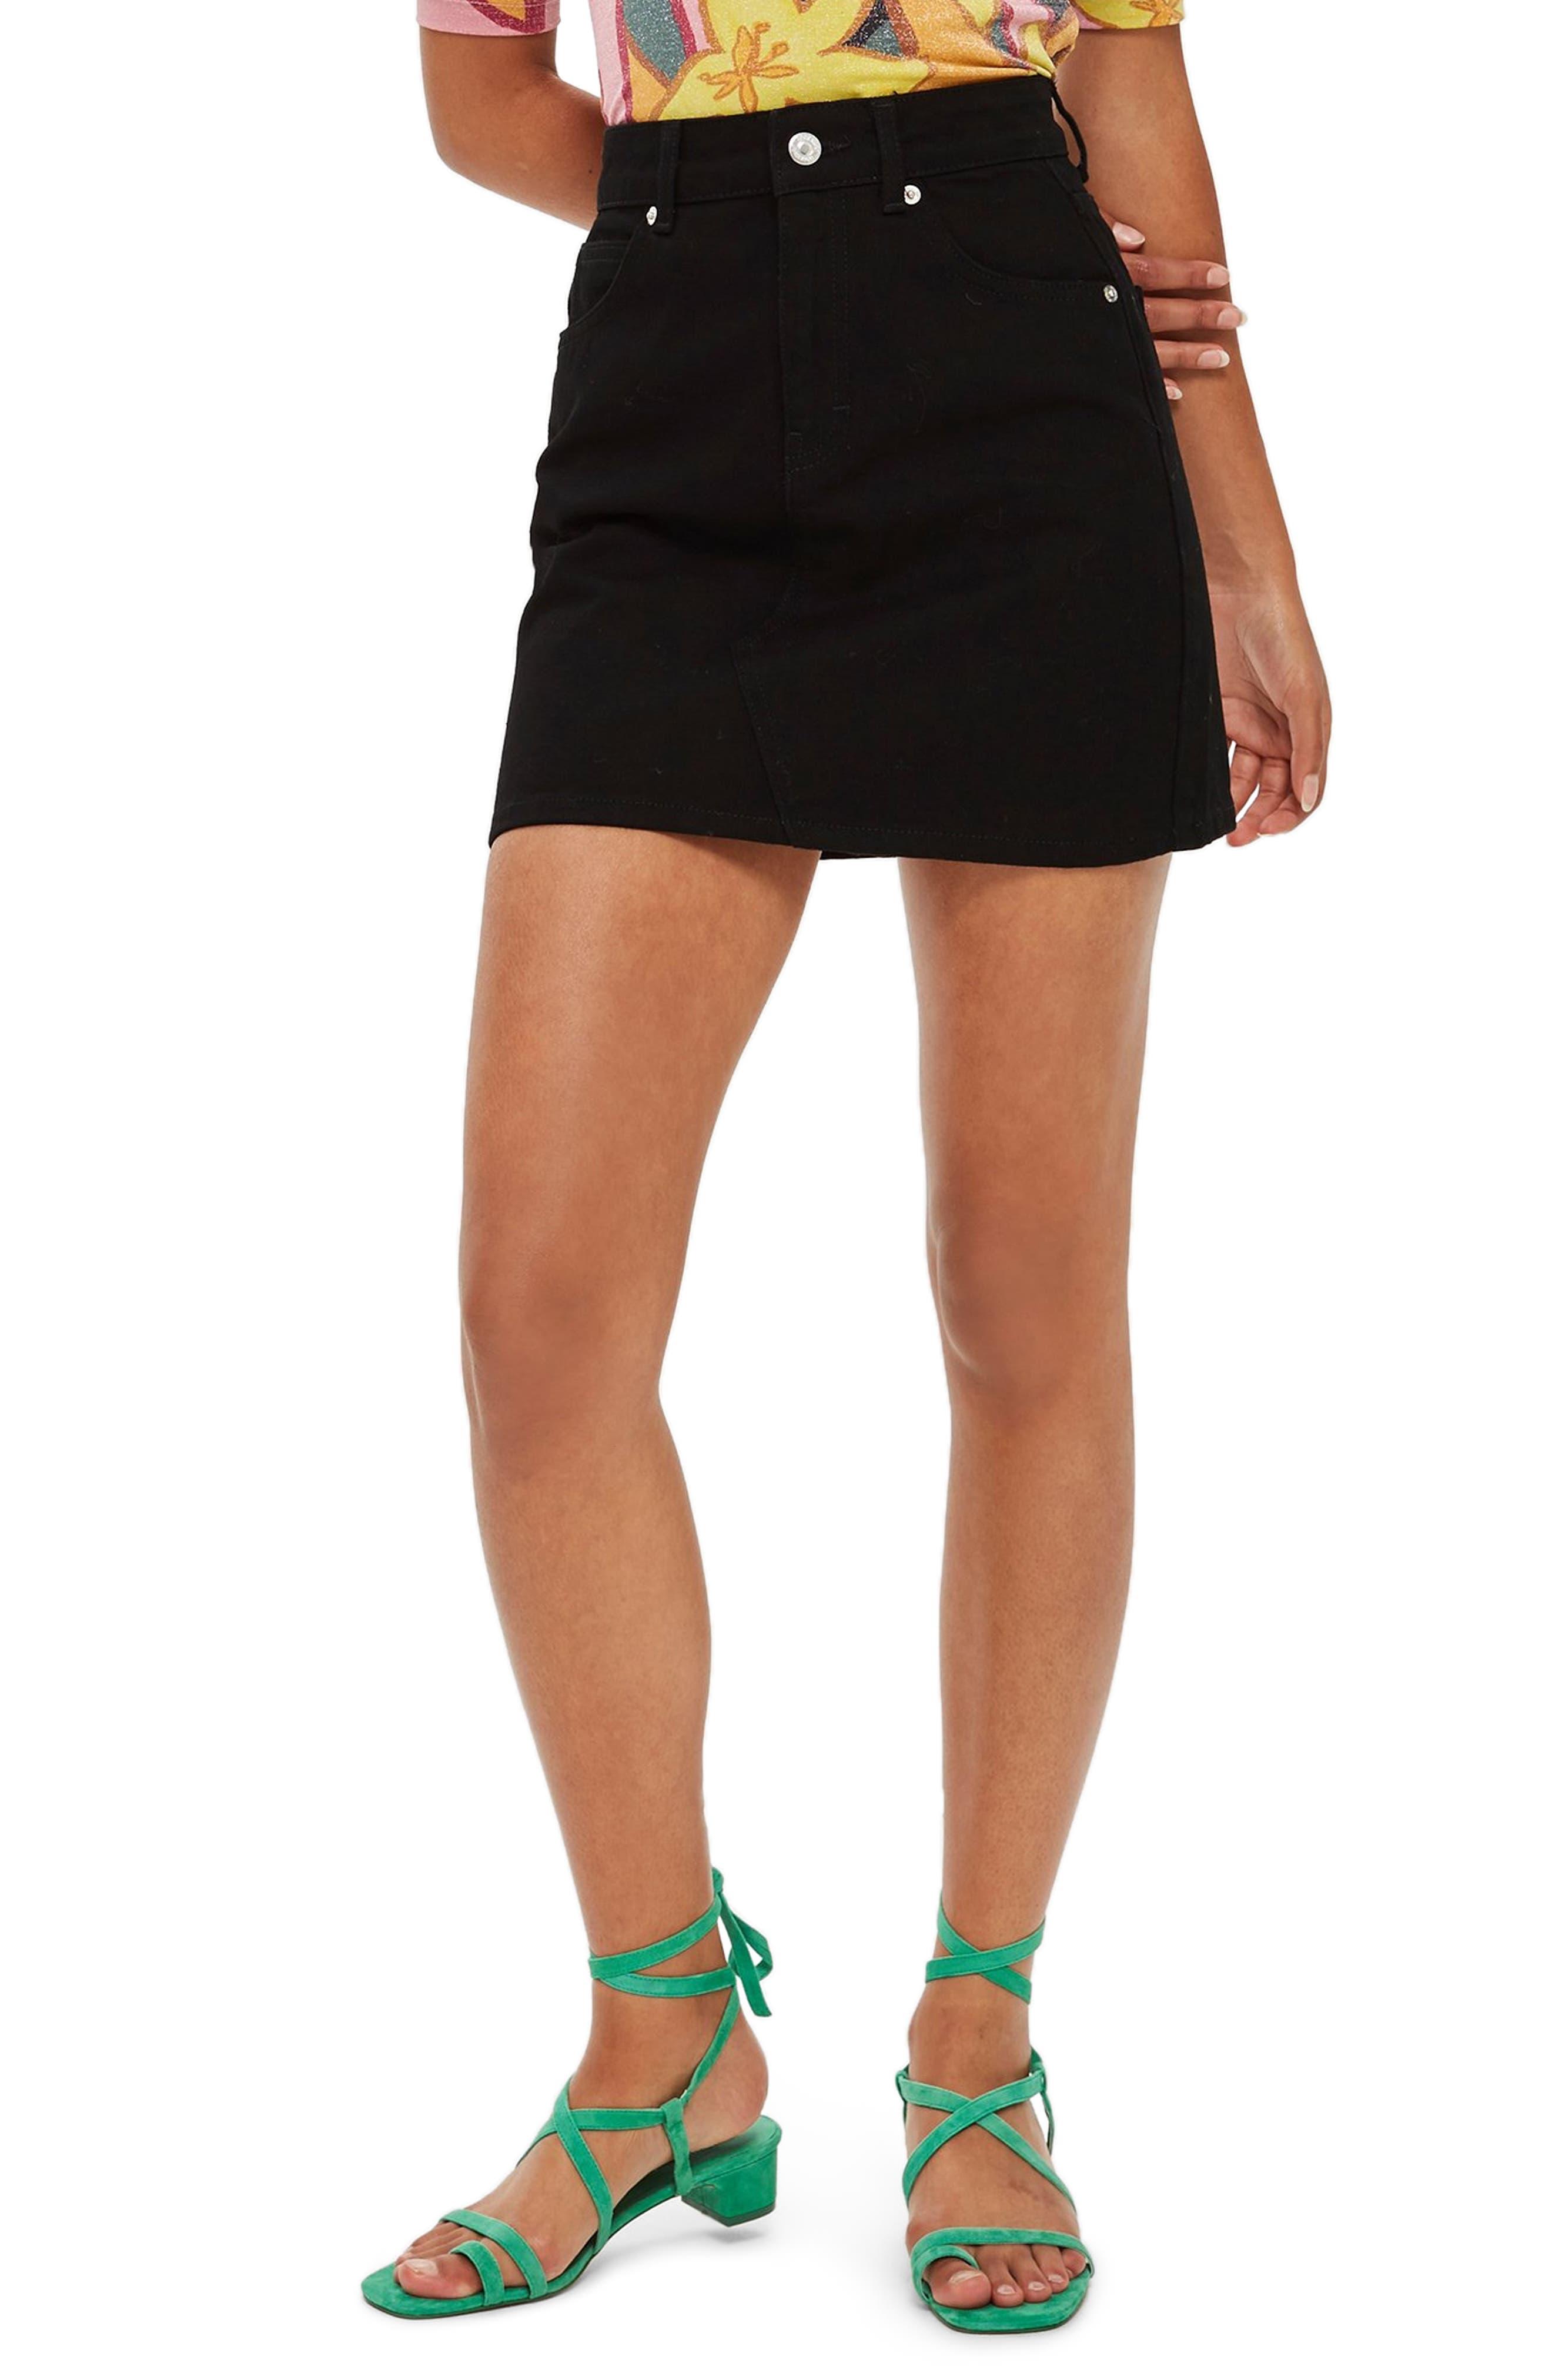 Petite Topshop High Waist Denim Skirt, P US (fits like 14P) - Black